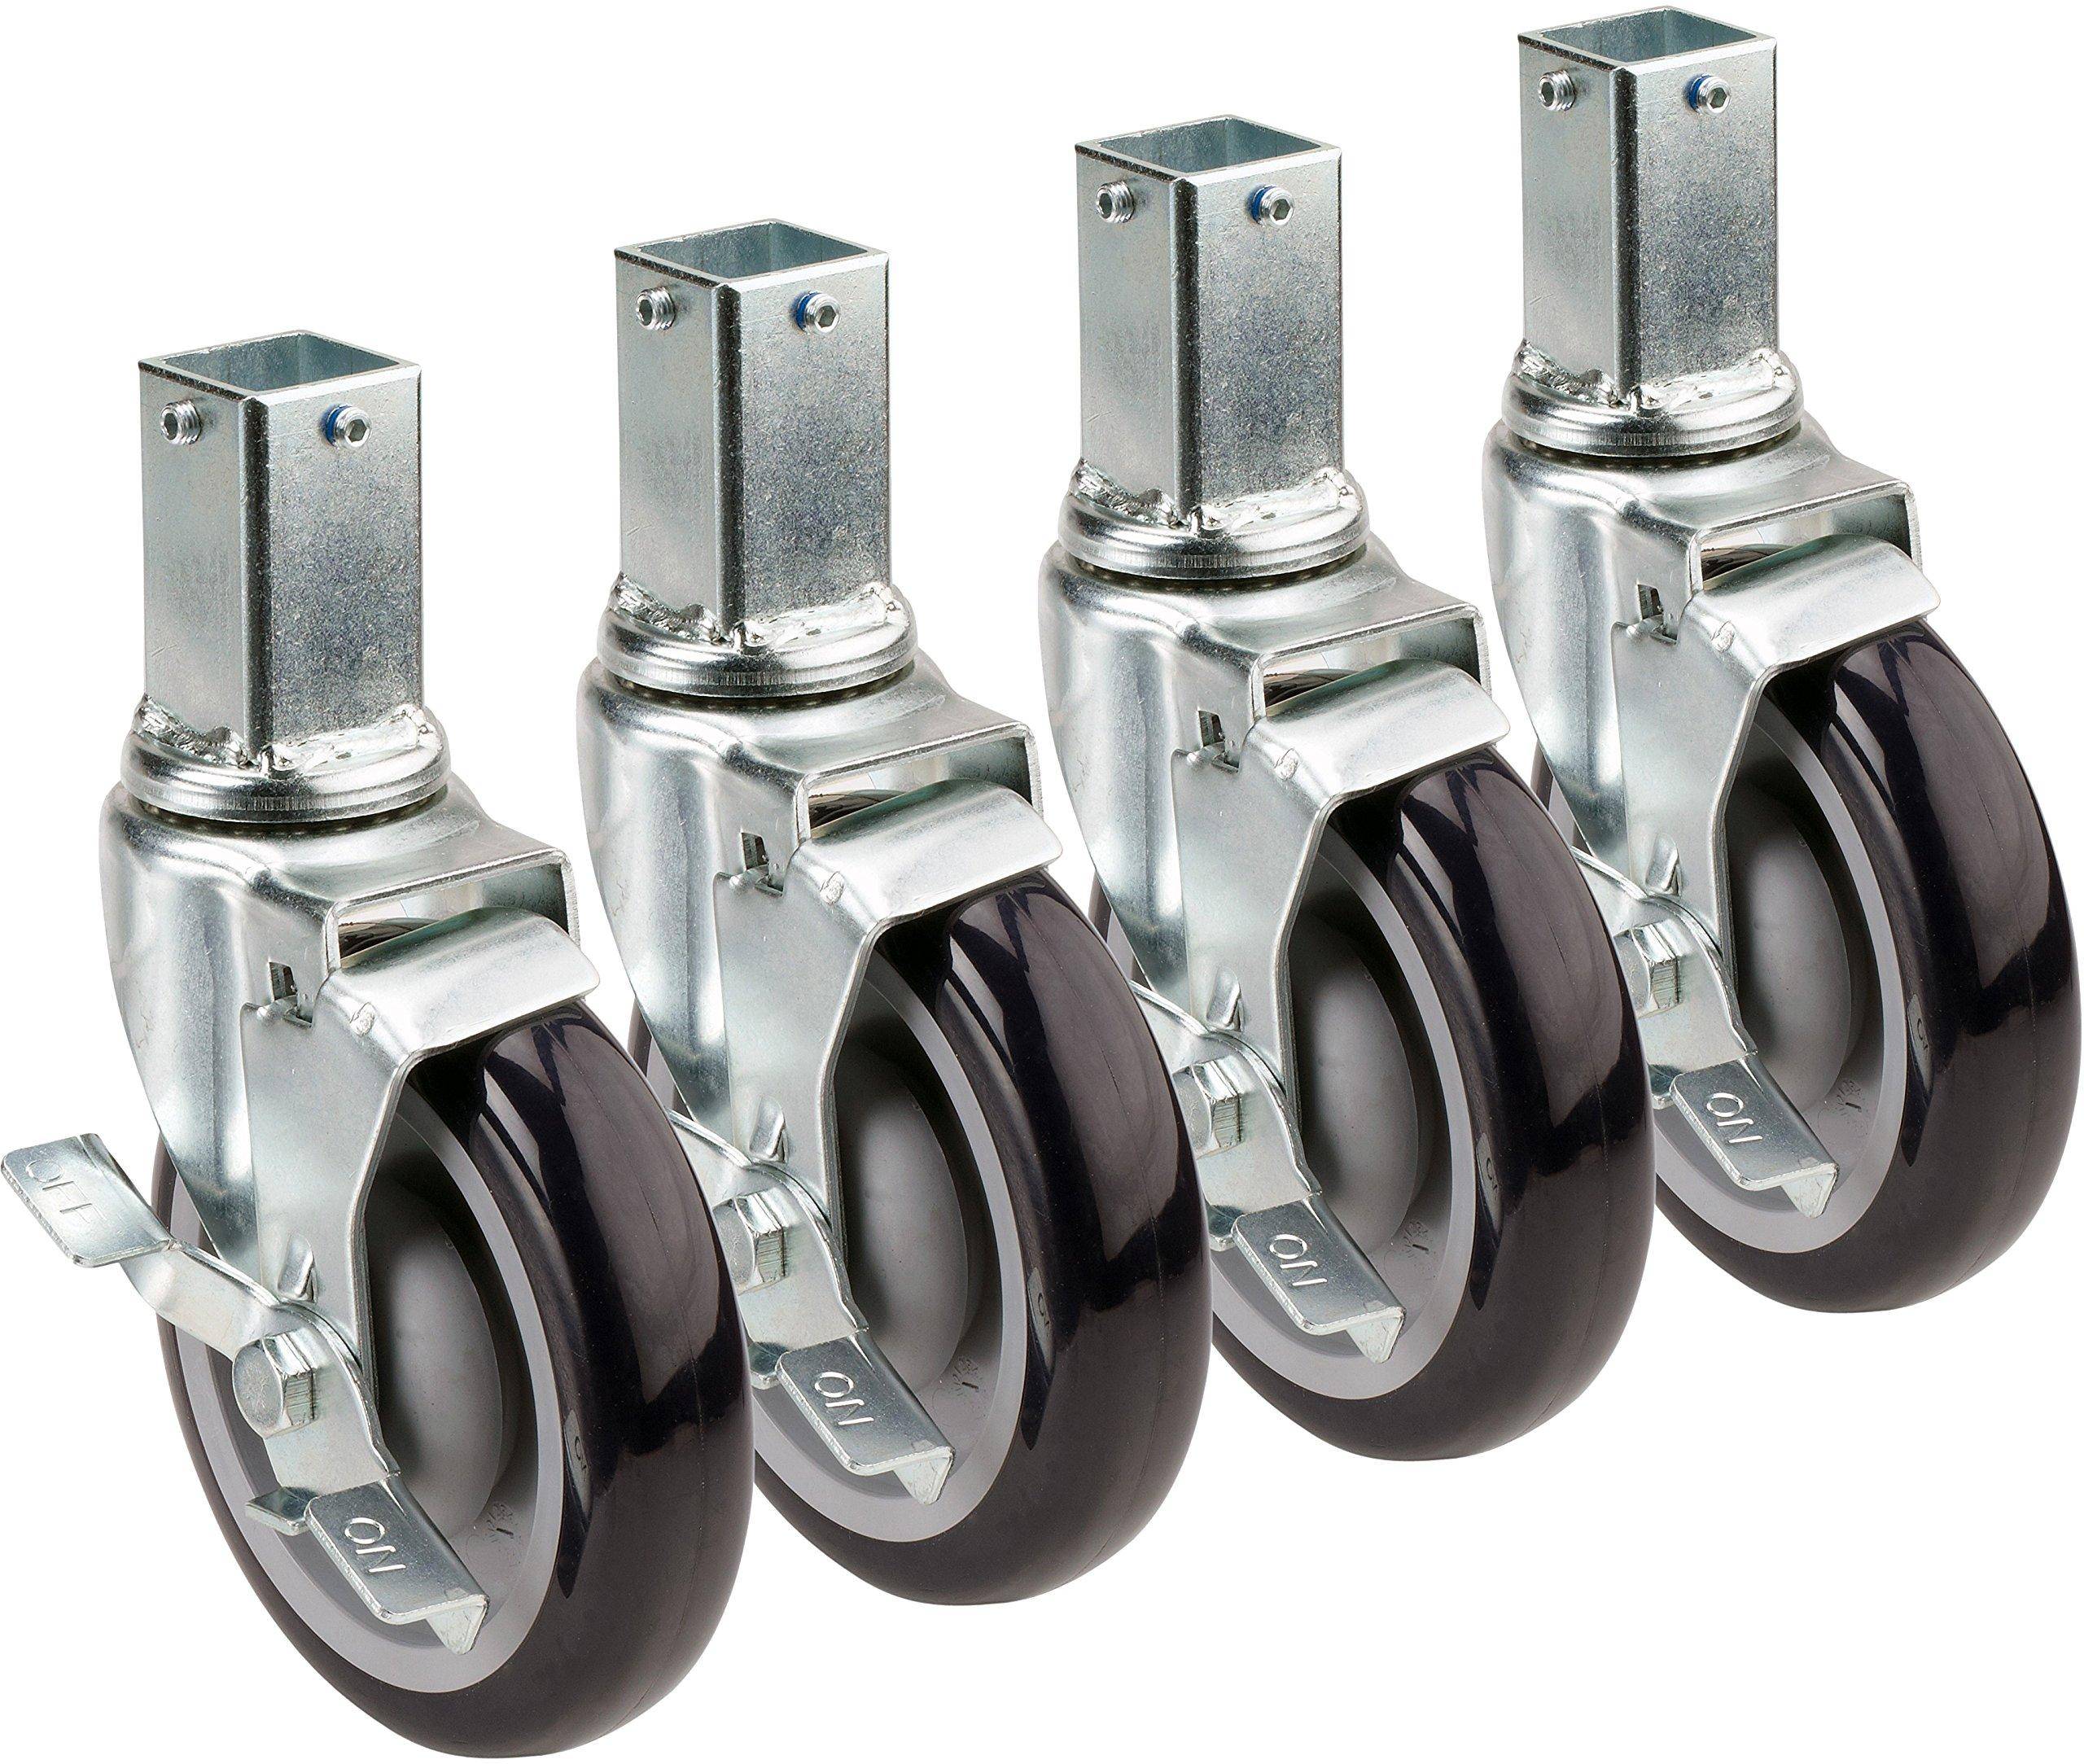 Krowne Metal 28-172S Set of (4) 1'' Square Post Shelving Casters with Locking Wheels, 5'' Diameter (Raises Height 6'')